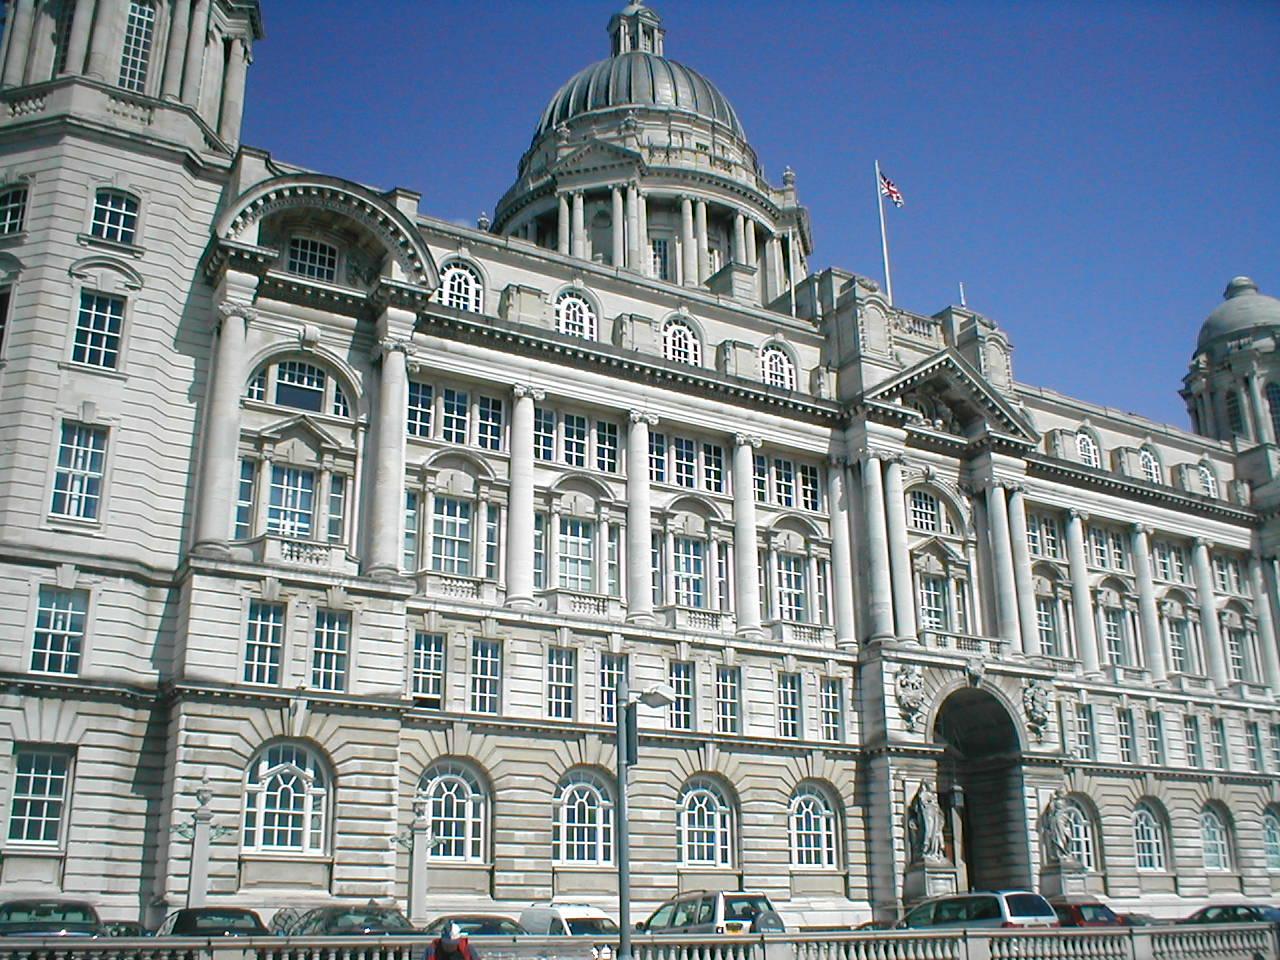 Photo: Port of Liverpool Building, Liverpool By NeilEvans via Wikimedia Commons (public domain) https://commons.wikimedia.org/wiki/File:PortofLiverpool.JPG  ★画像使用記事 『刑事フォイル』 http://inagara.octsky.net/keiji-foyle